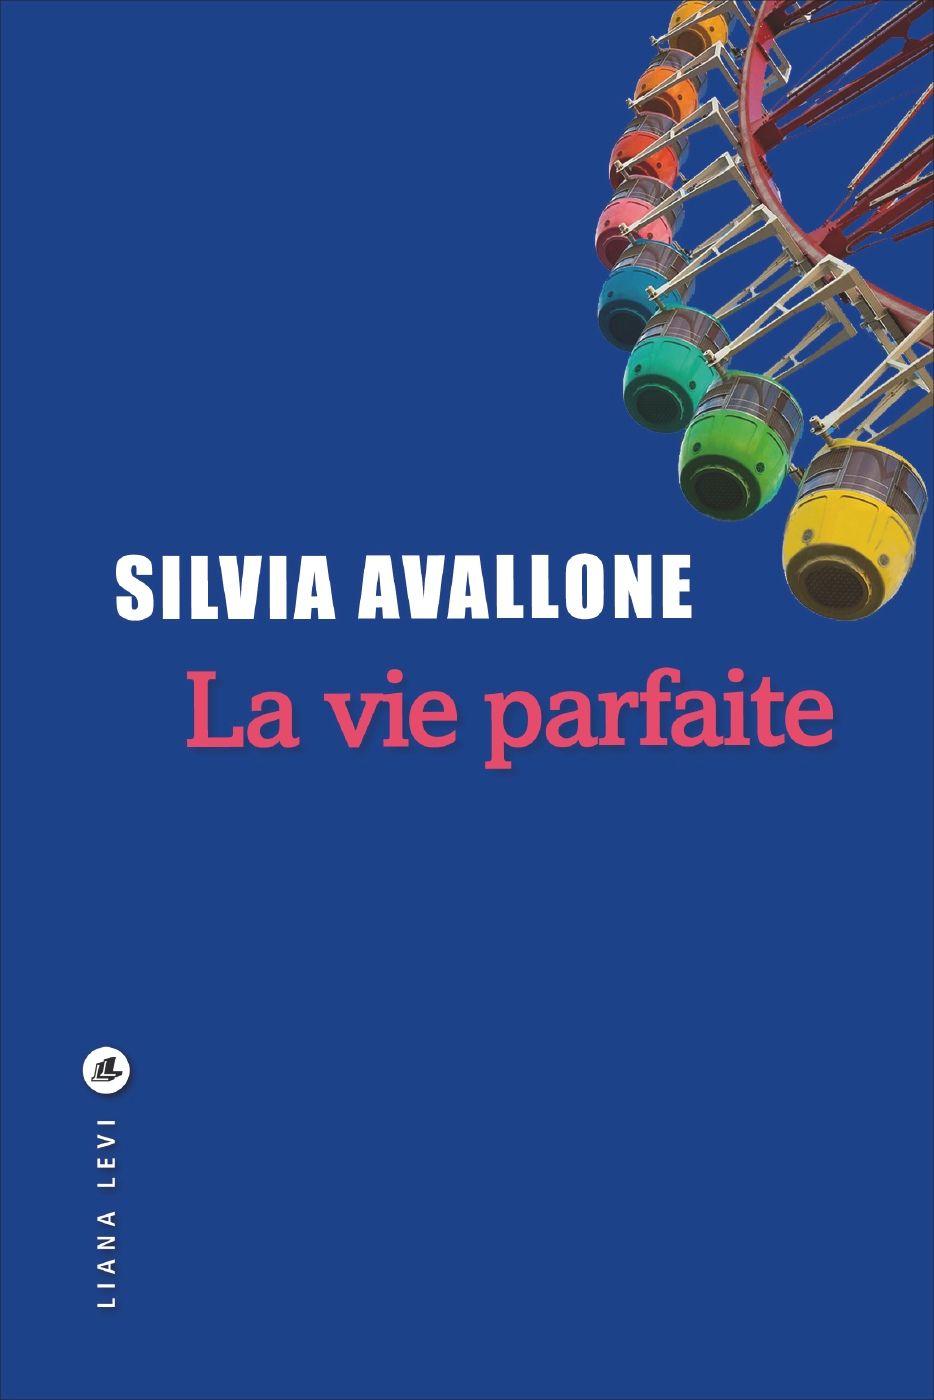 La vie parfaite | AVALLONE, Silvia